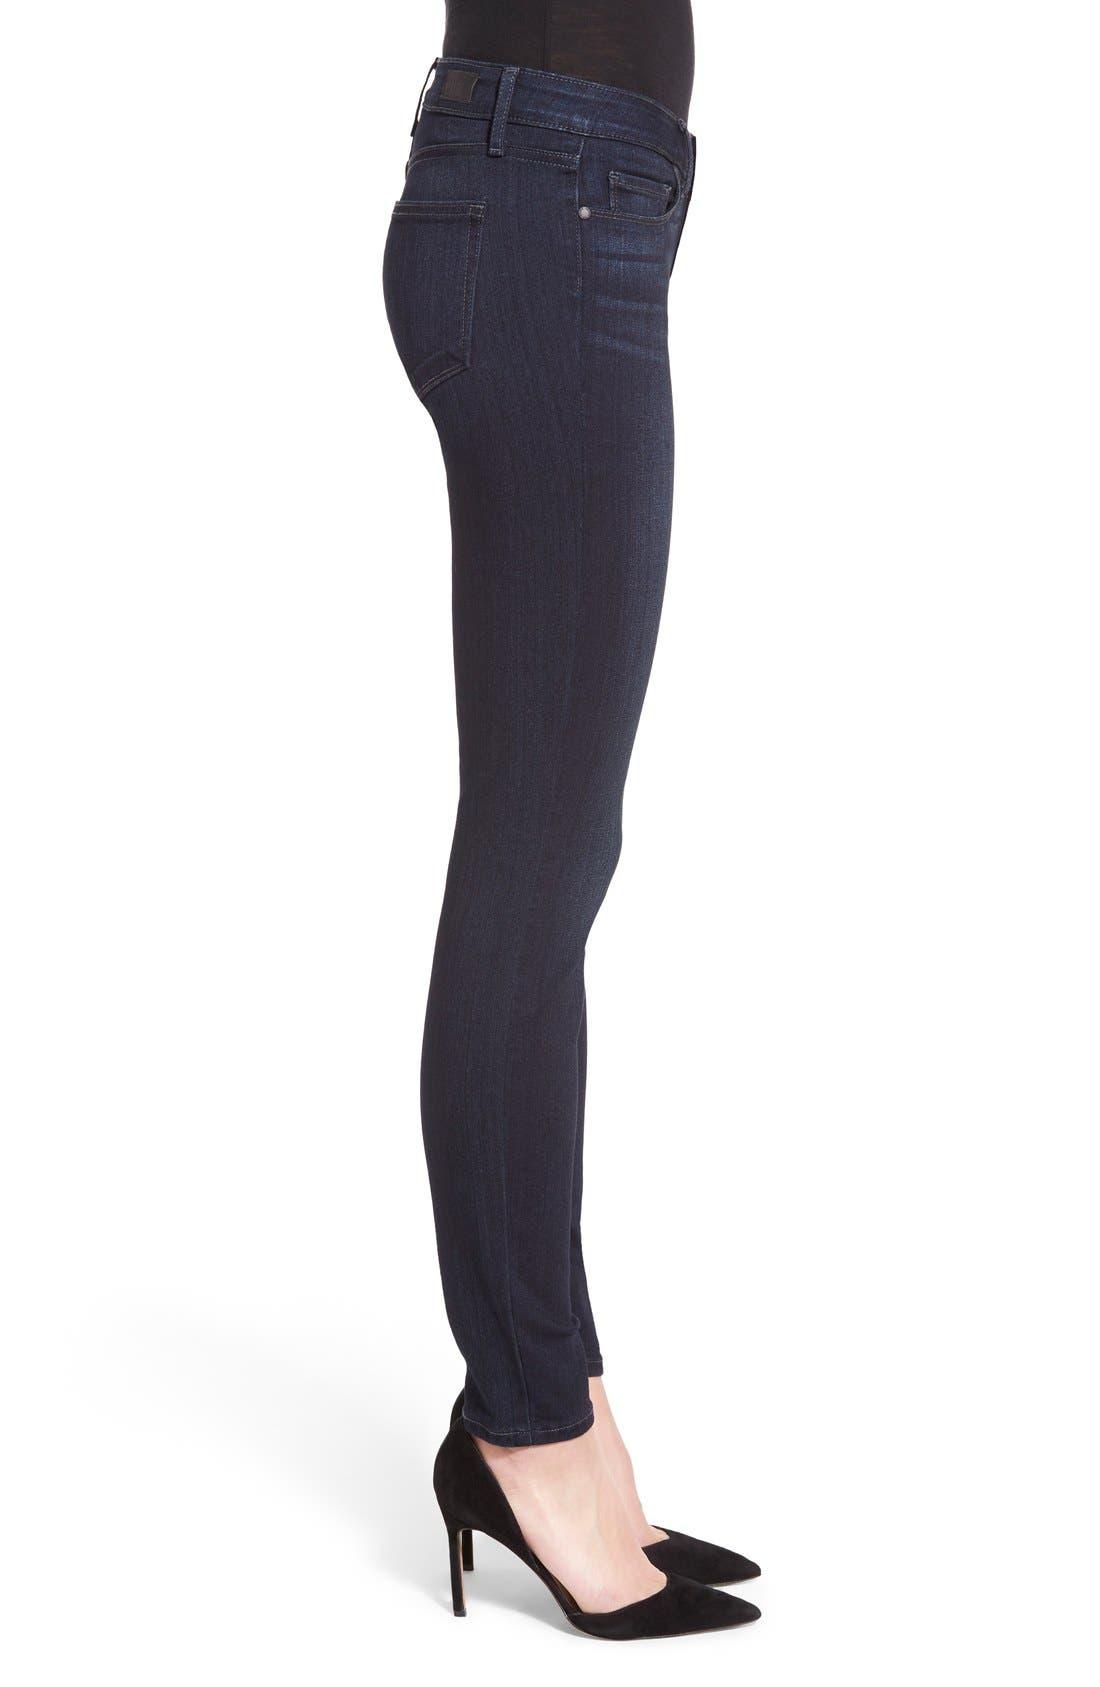 Transcend - Verdugo Ultra Skinny Jeans,                             Alternate thumbnail 4, color,